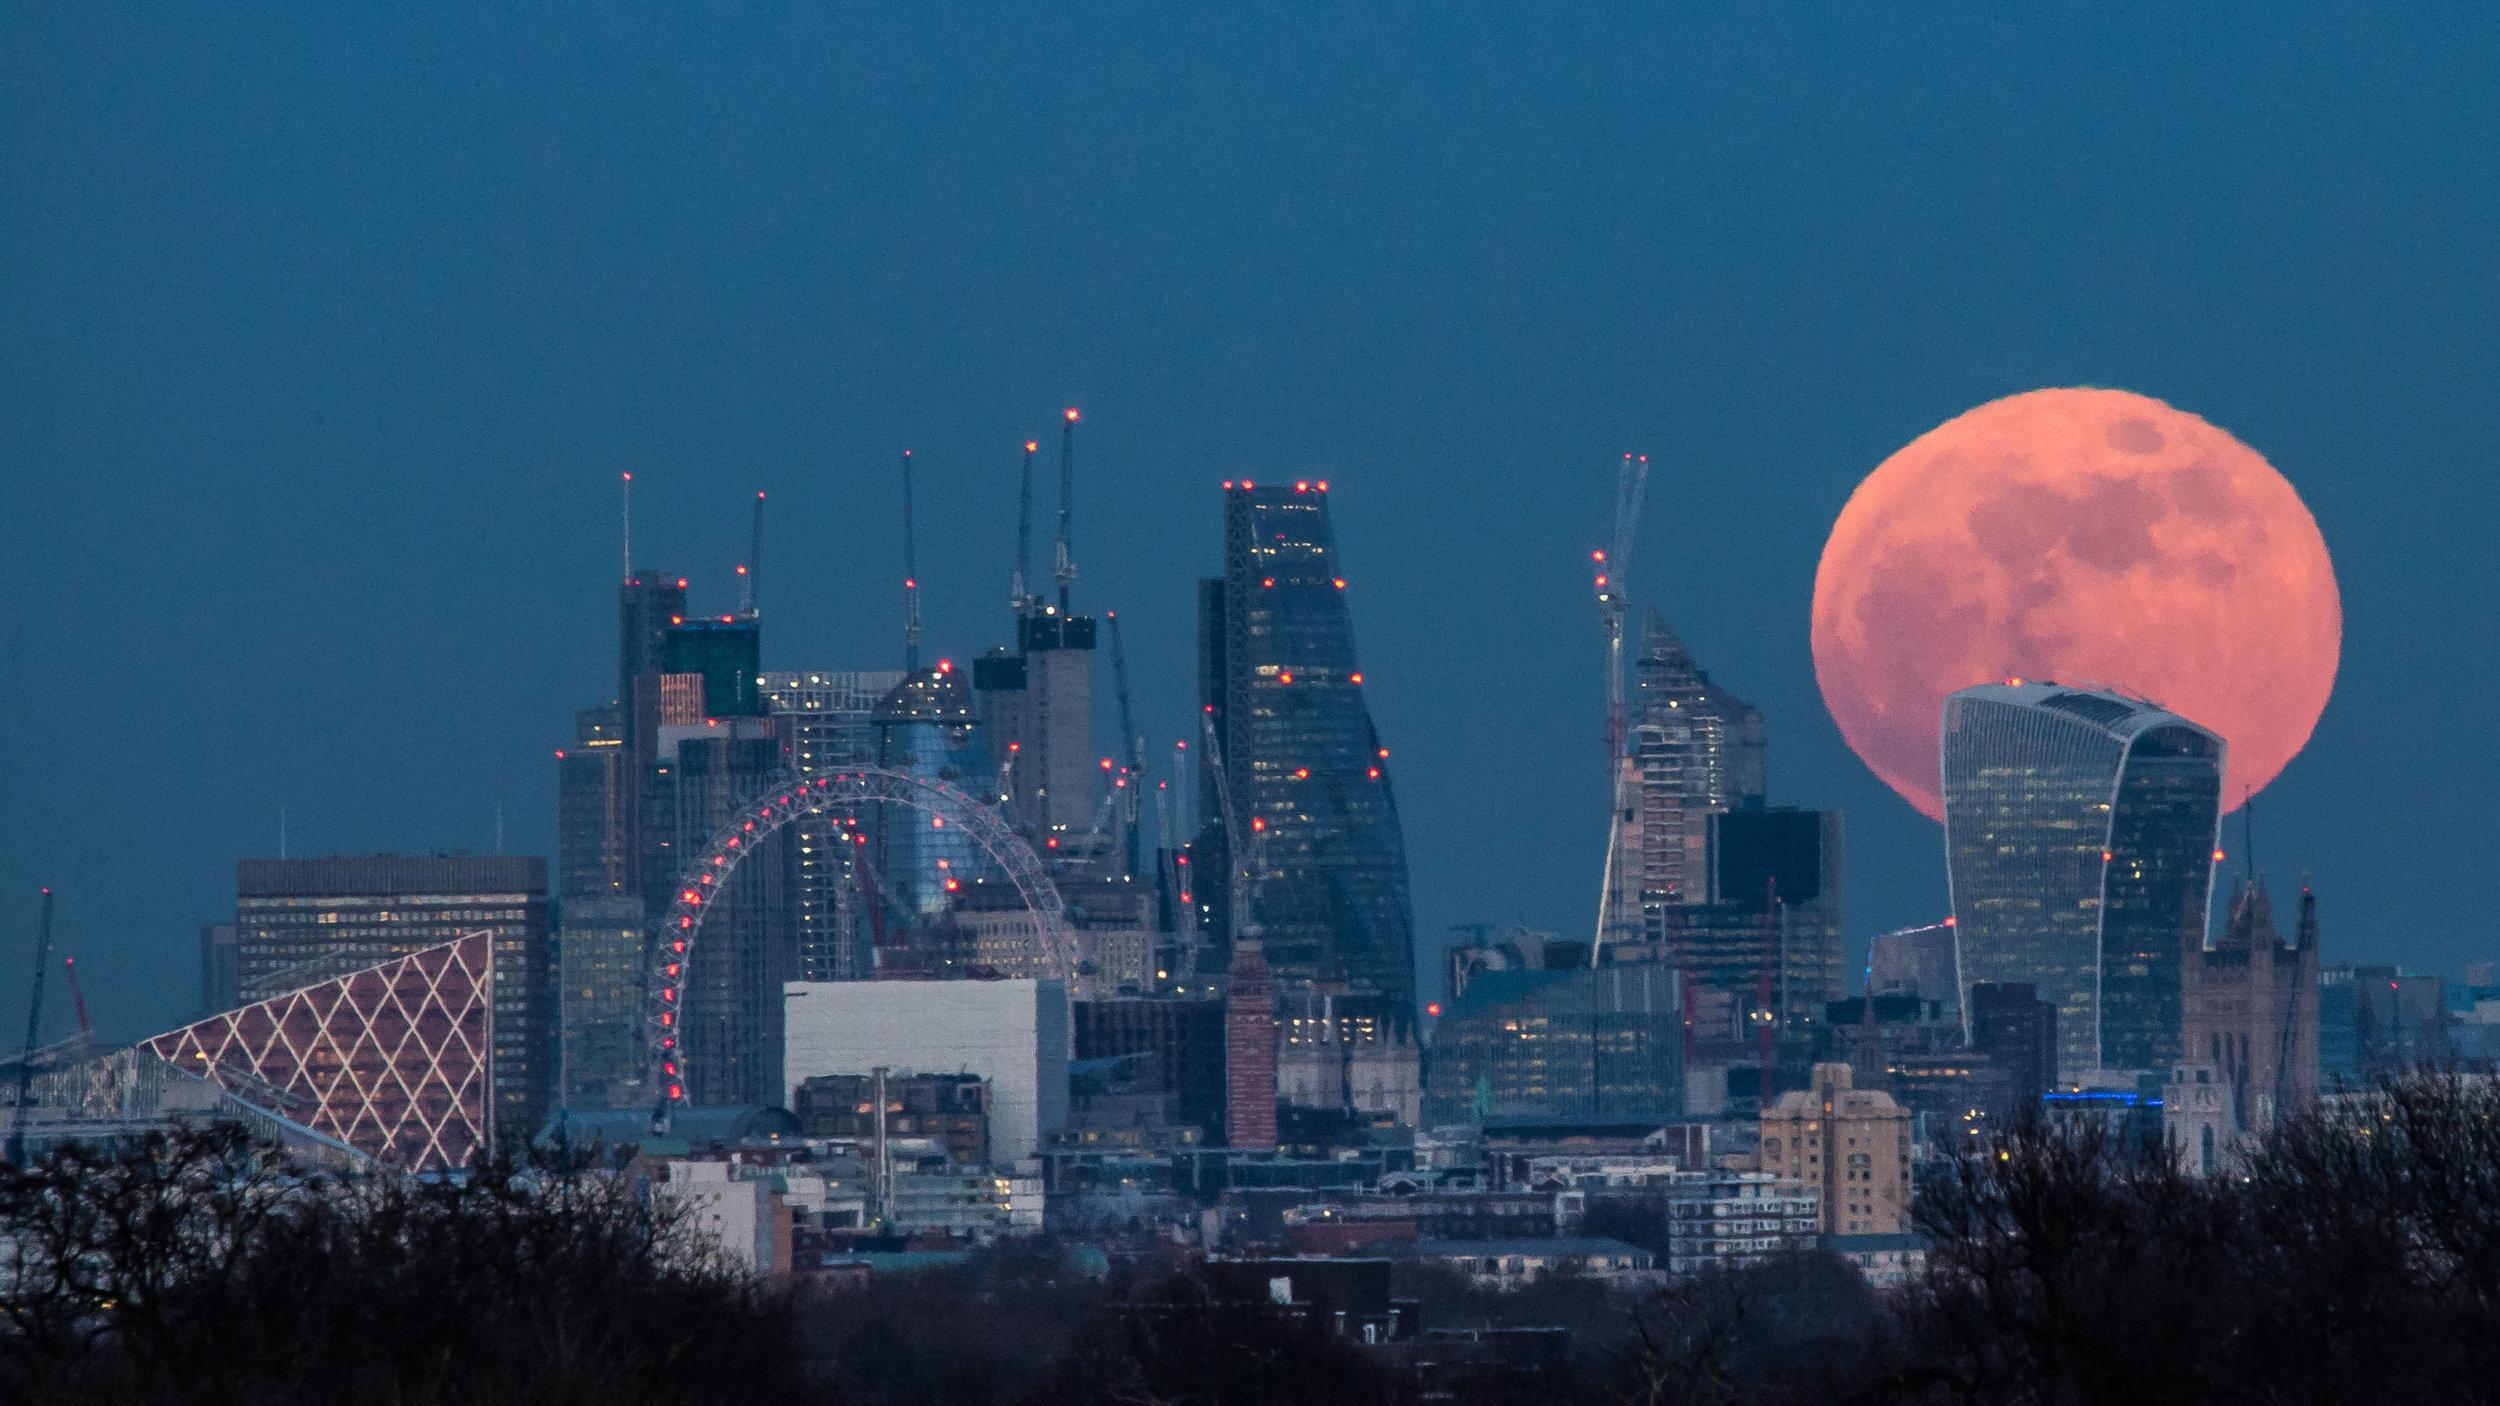 The Super Blood Moon illuminates the city of London skyline as it rises on the 31/01/2018.